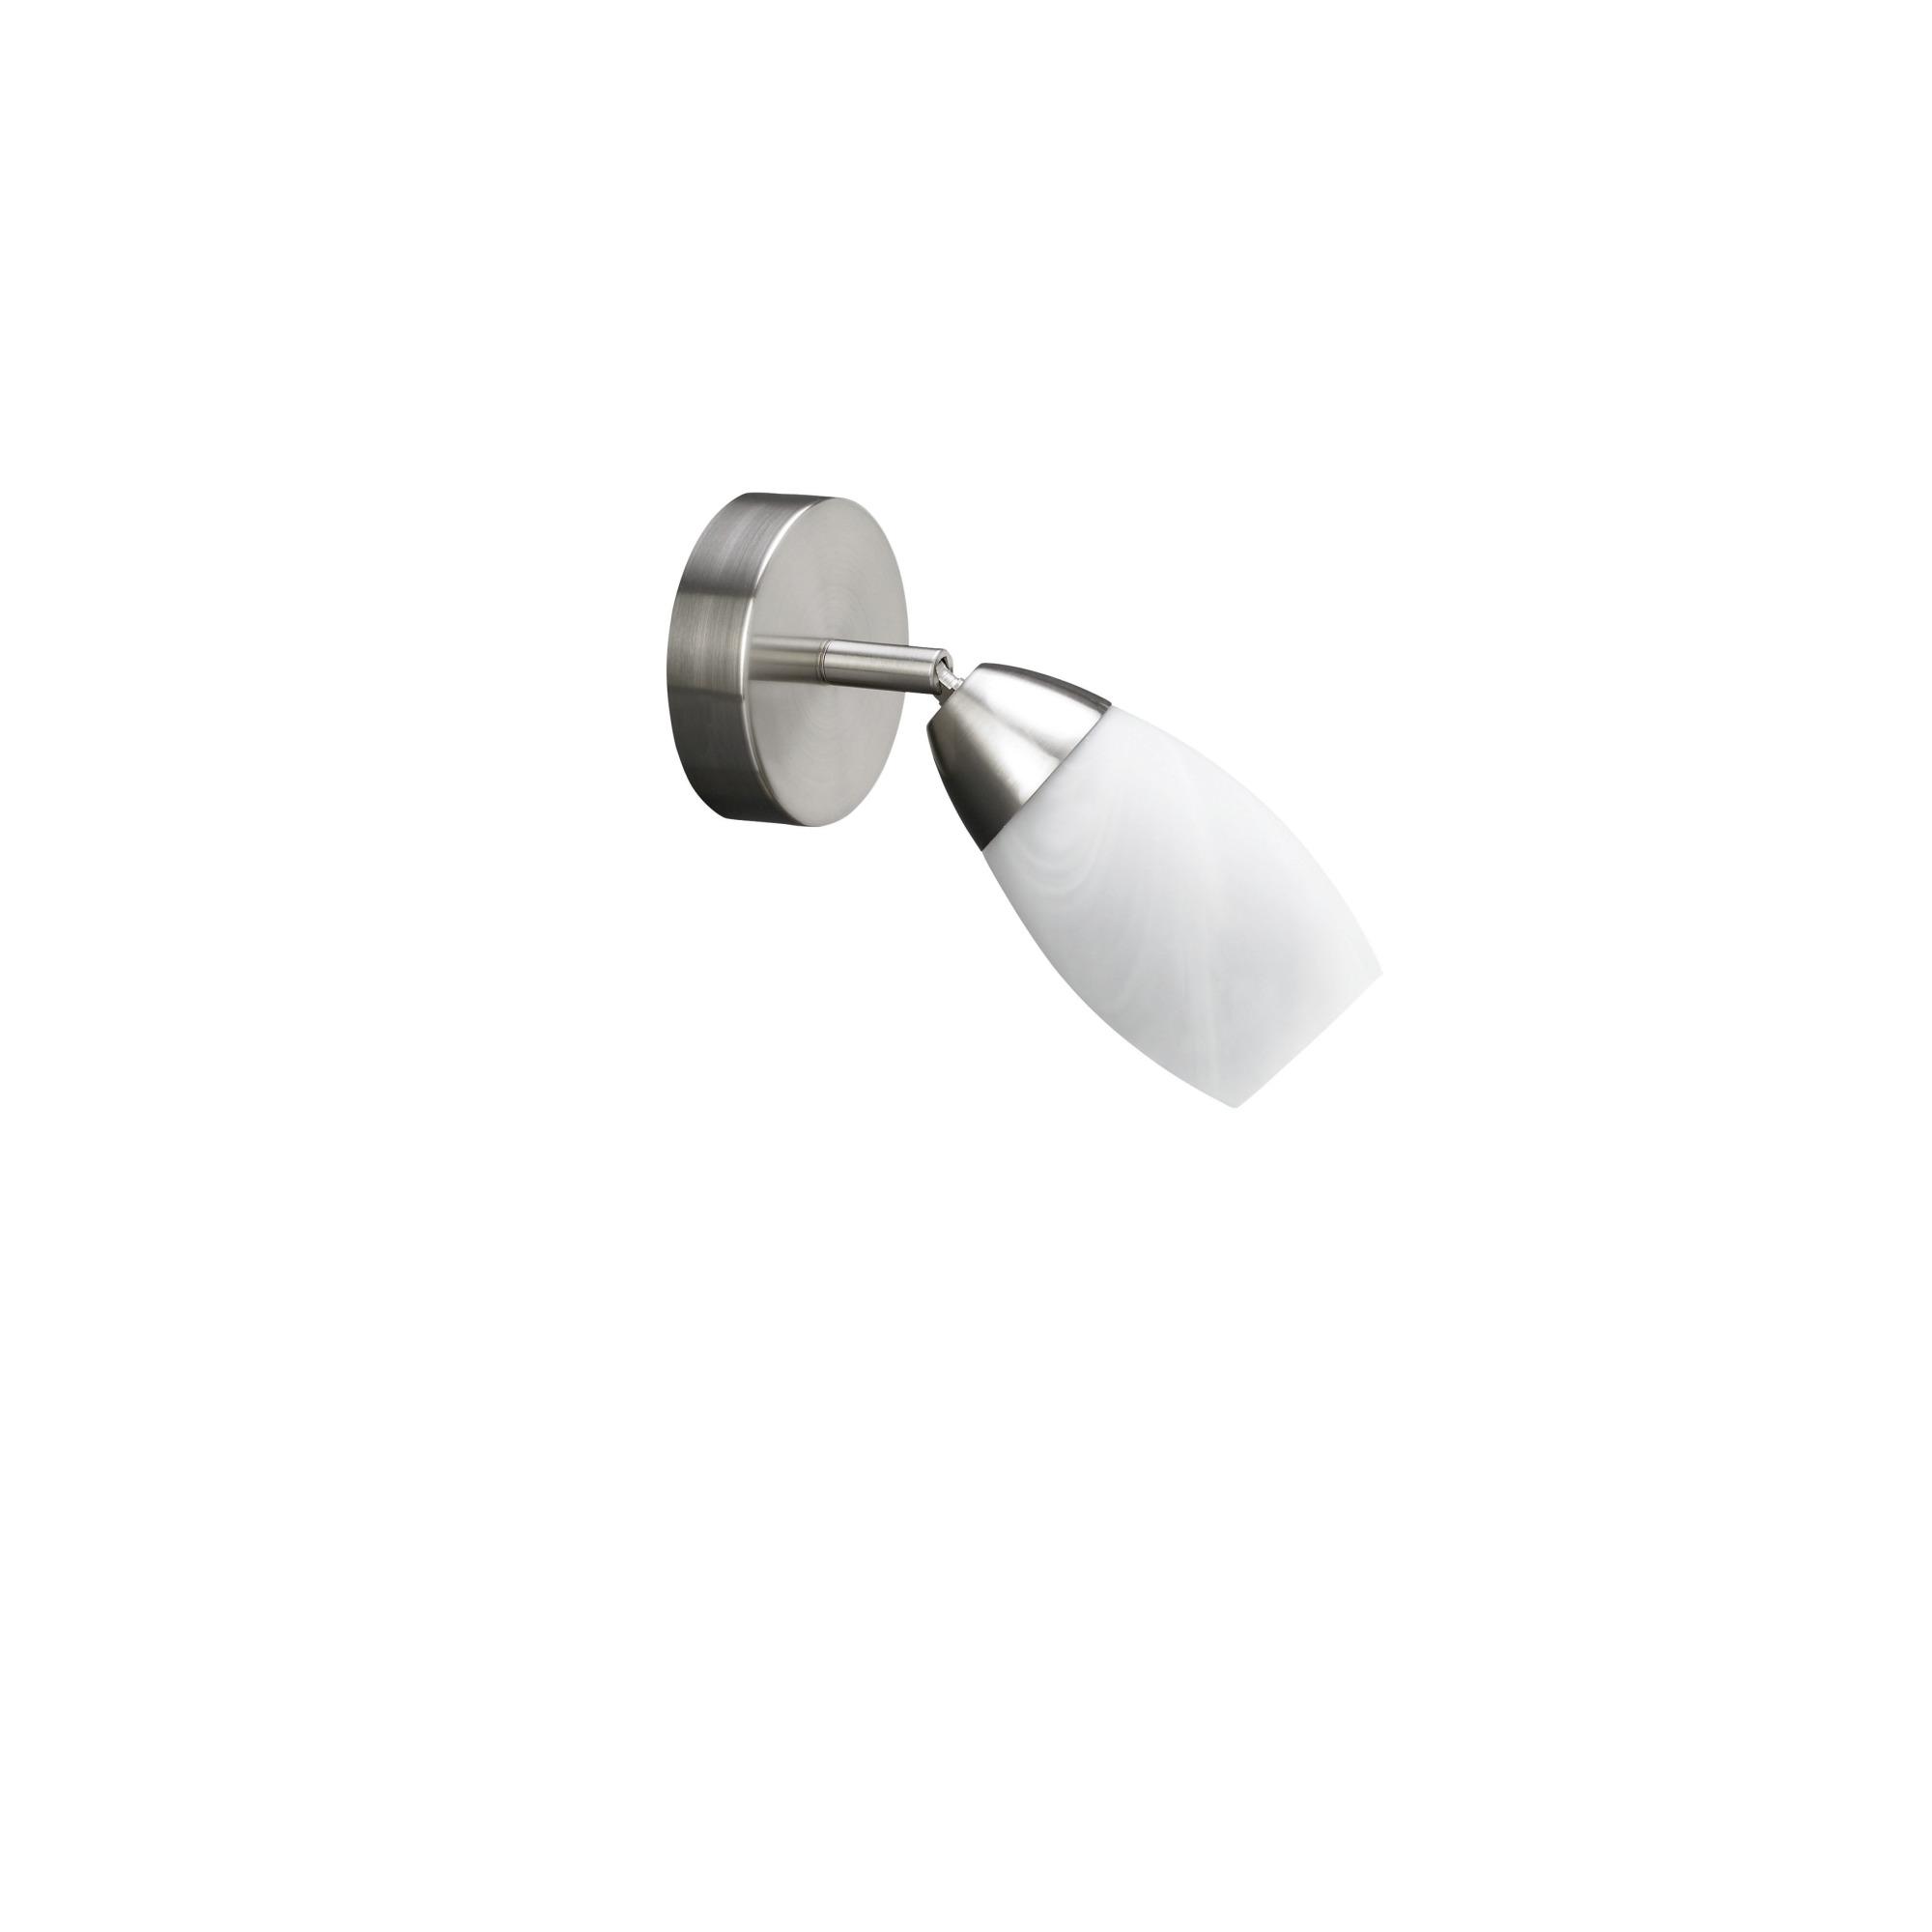 PORIUM wandspot grijs by Philips 501503110